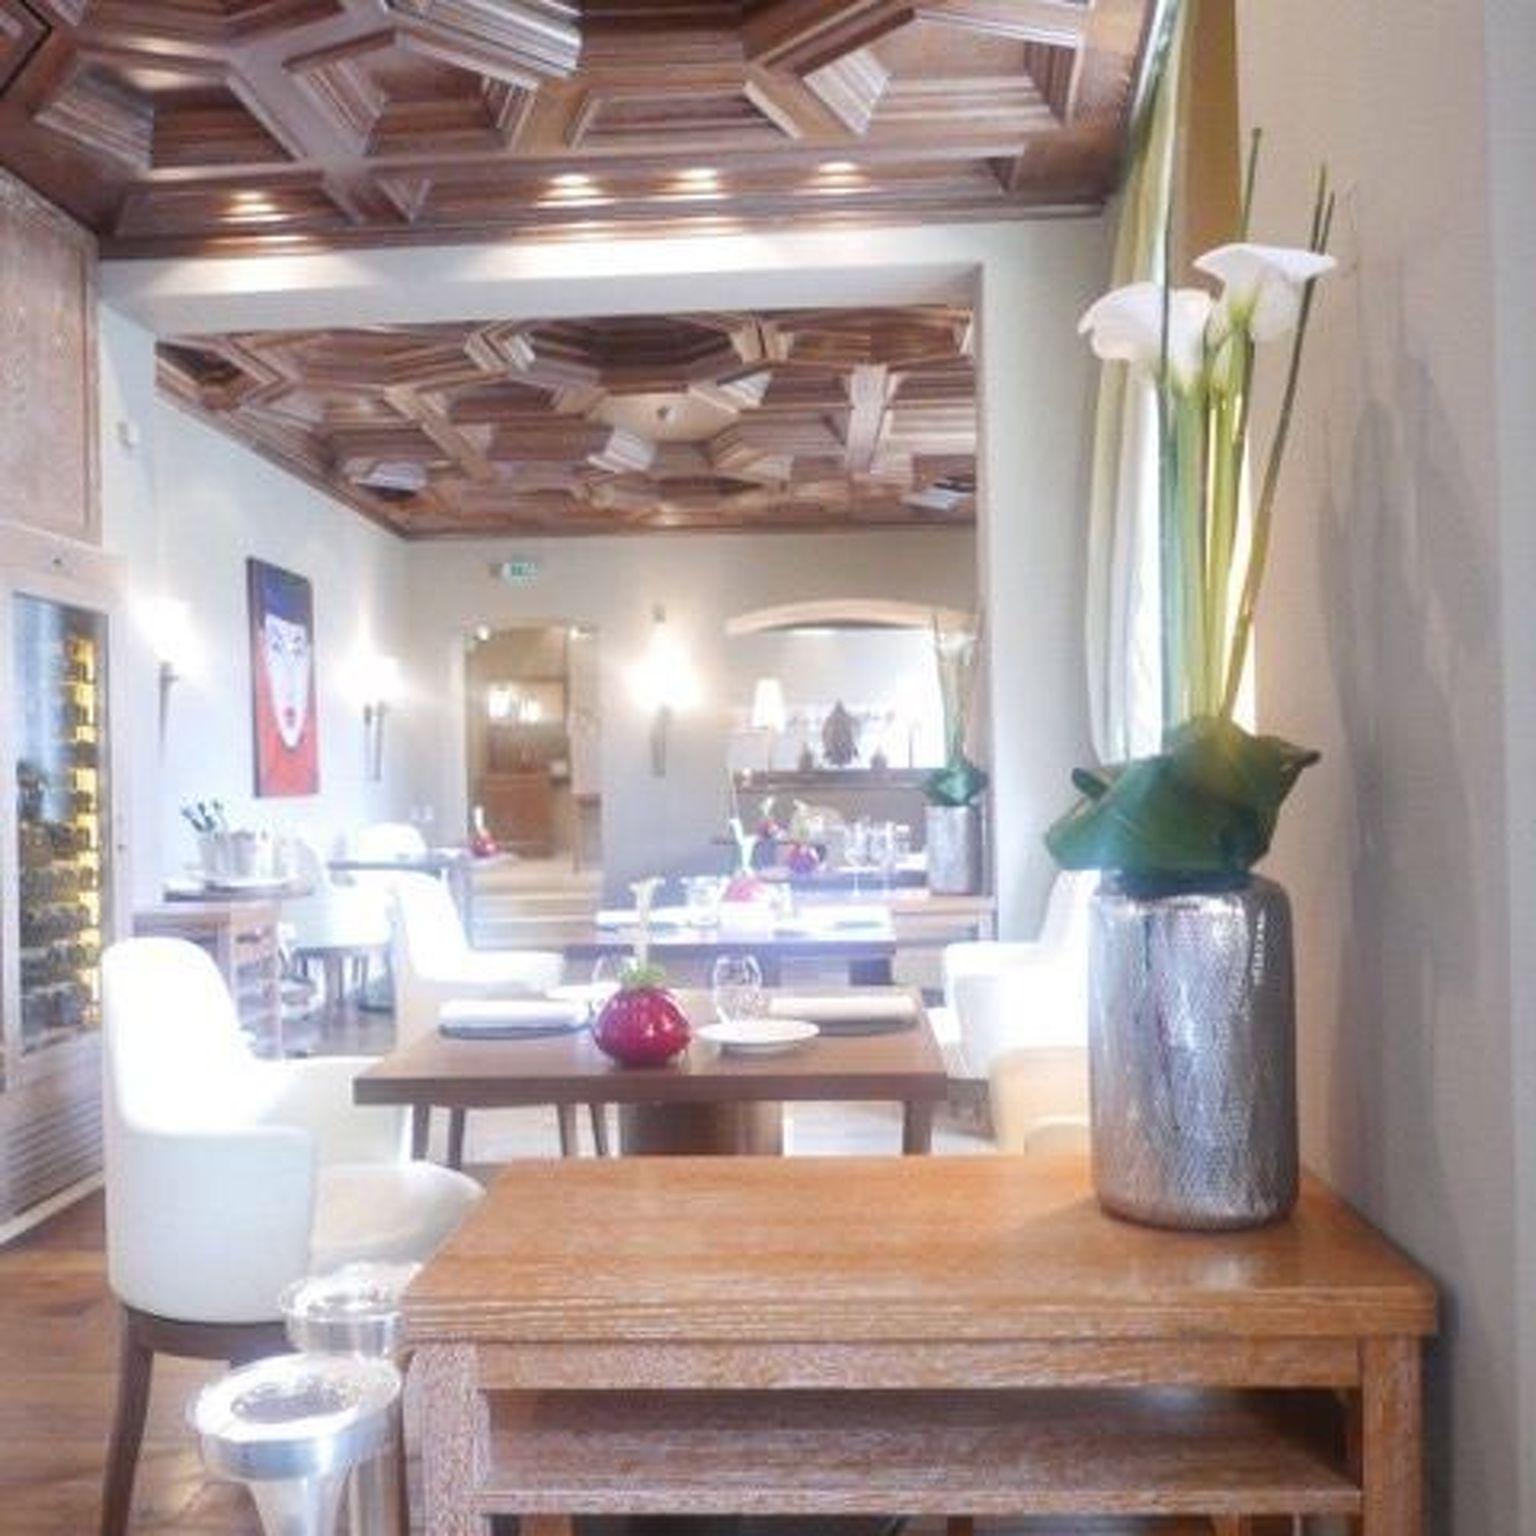 Christian Bau Restaurant